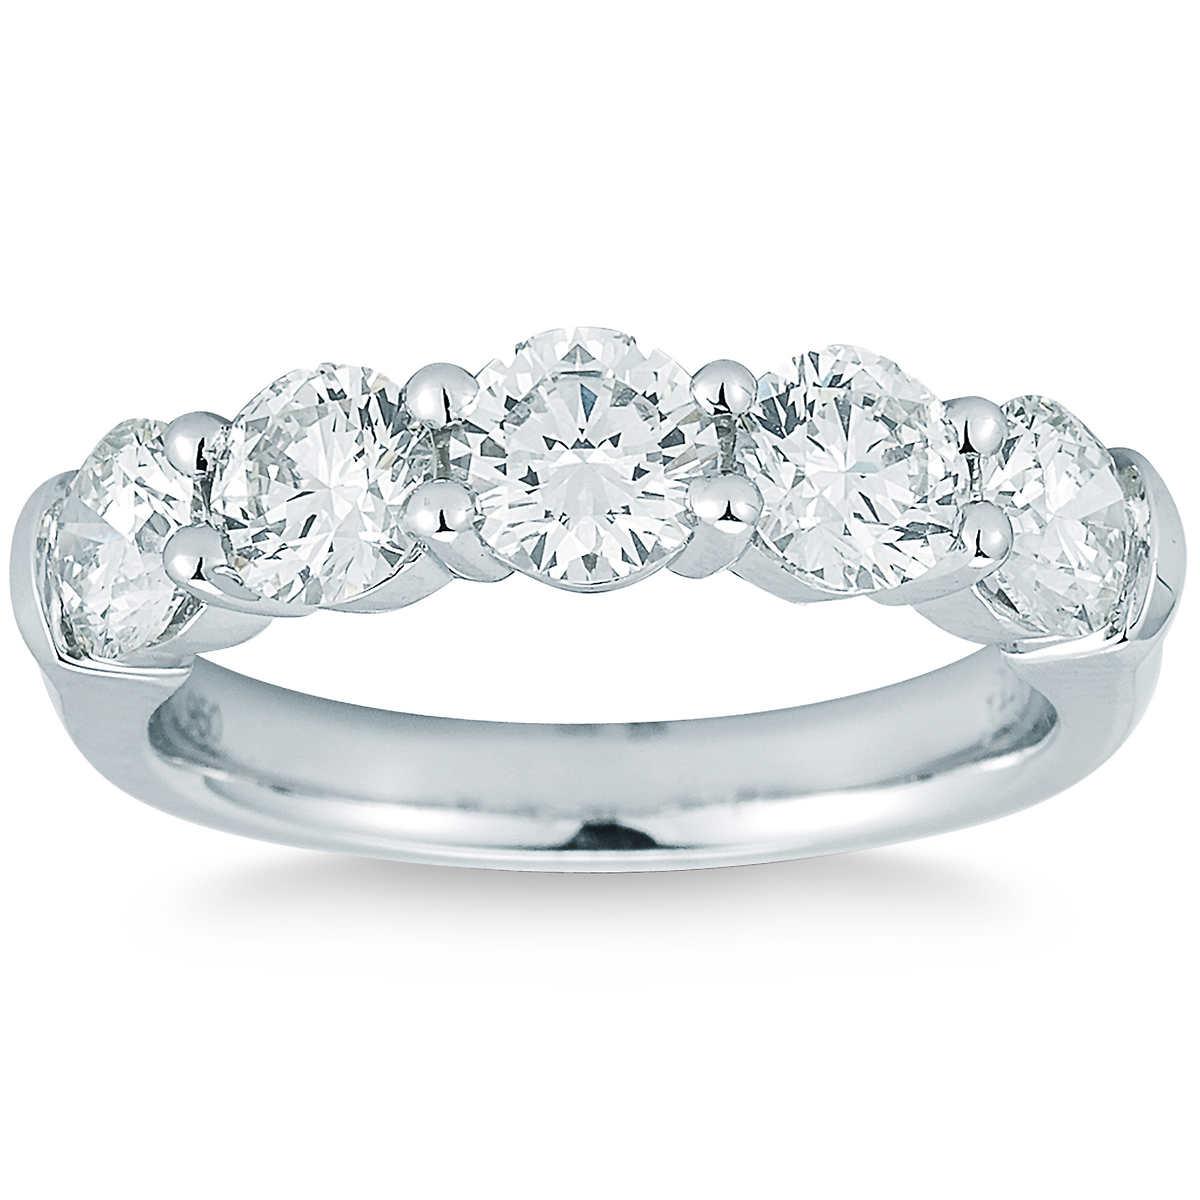 round brilliant 200 ctw vs2 clarity i color diamond platinum five stone ring - Costco Wedding Rings